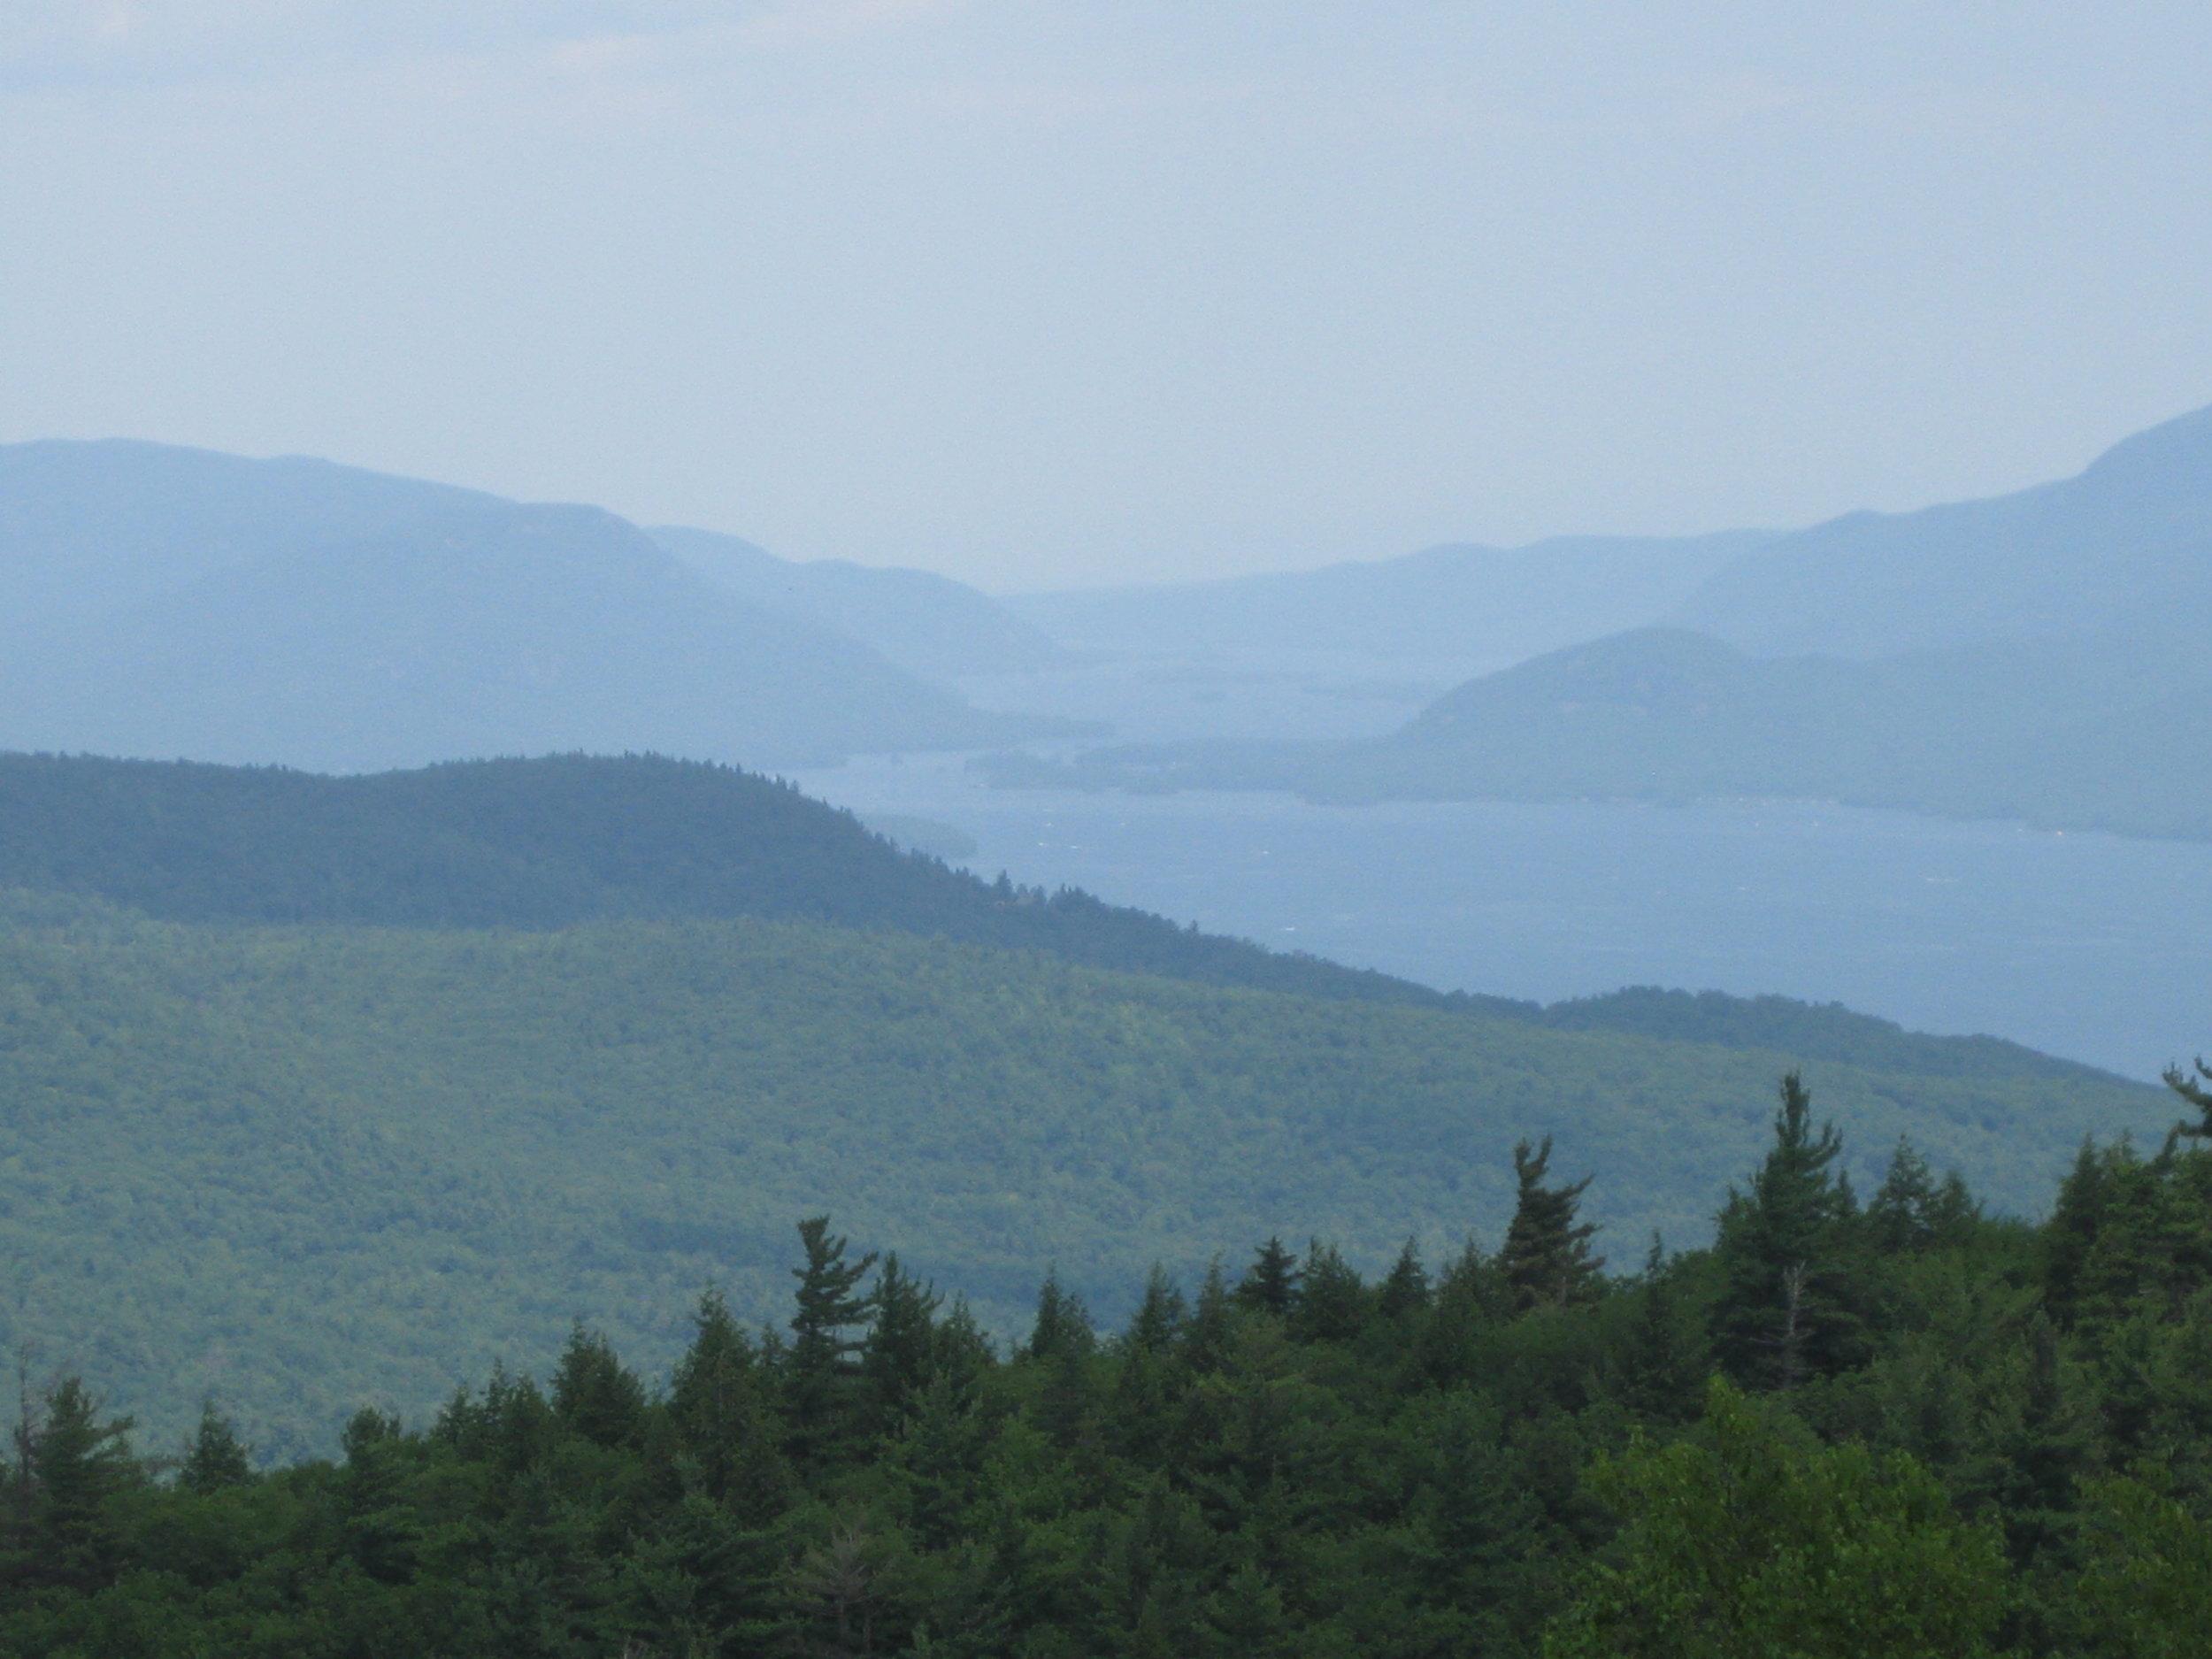 The Adirondacks, from Prospect Mountain